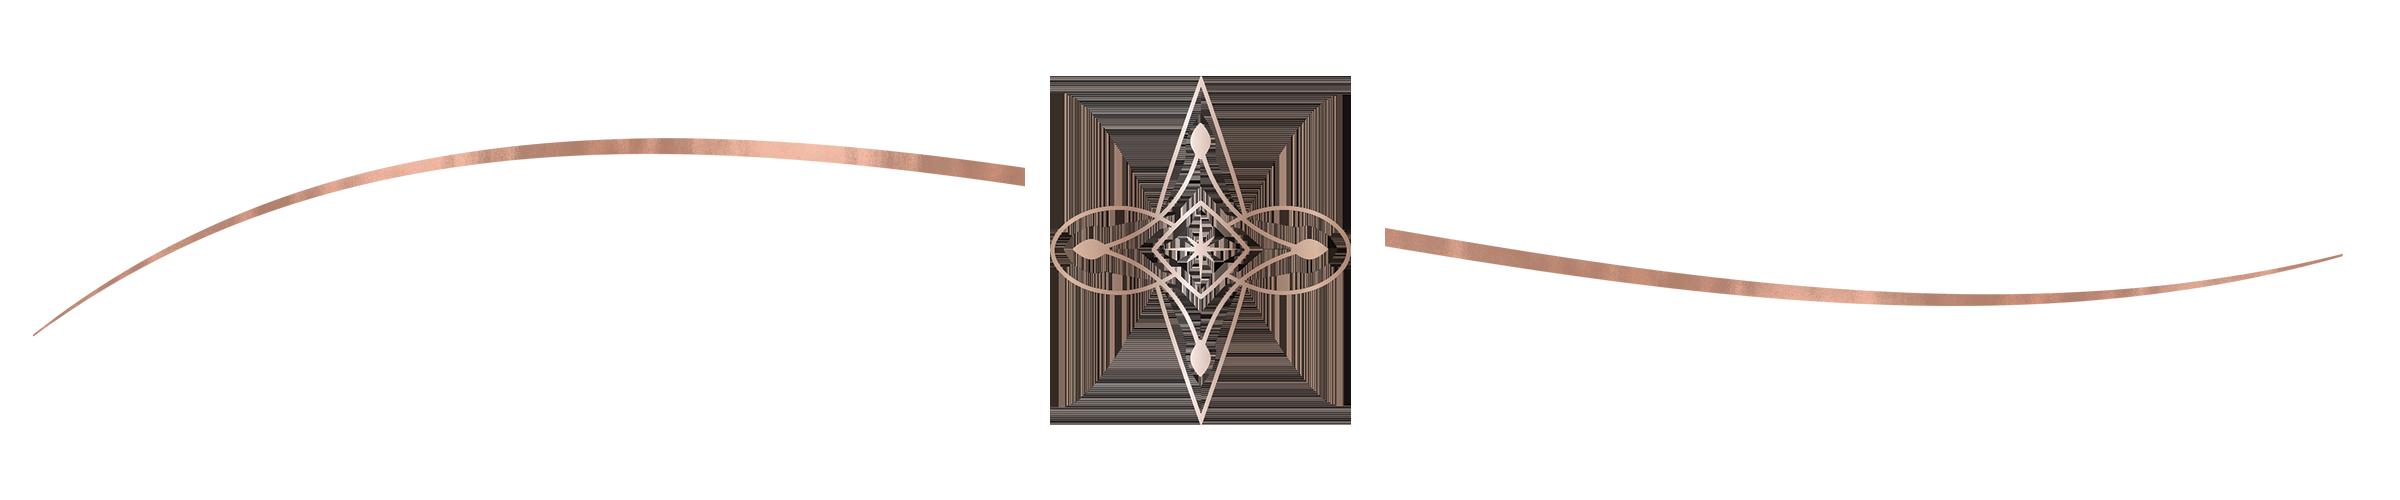 bronzelogocurve